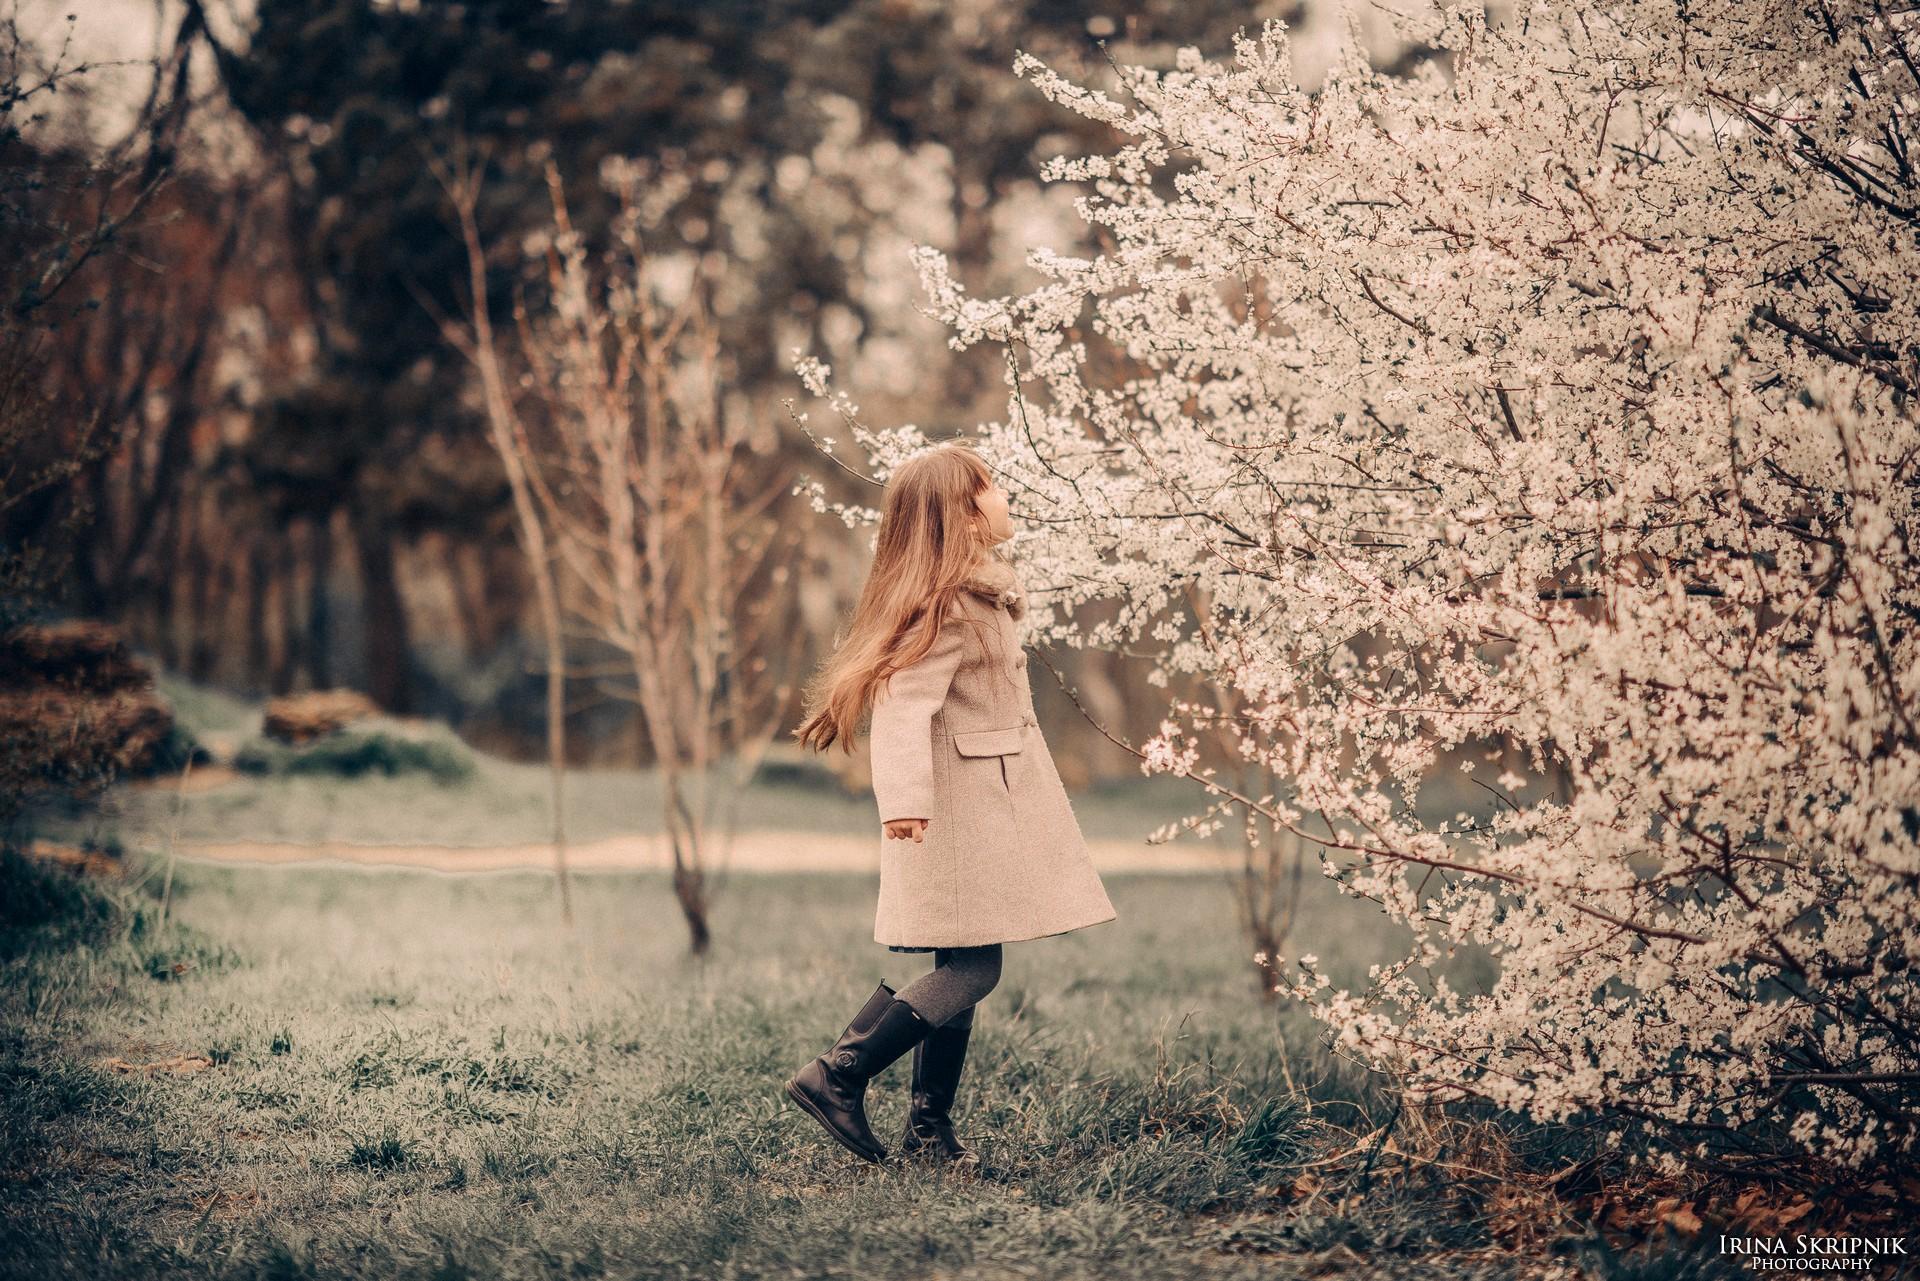 Irina Skripnik Photography 20162